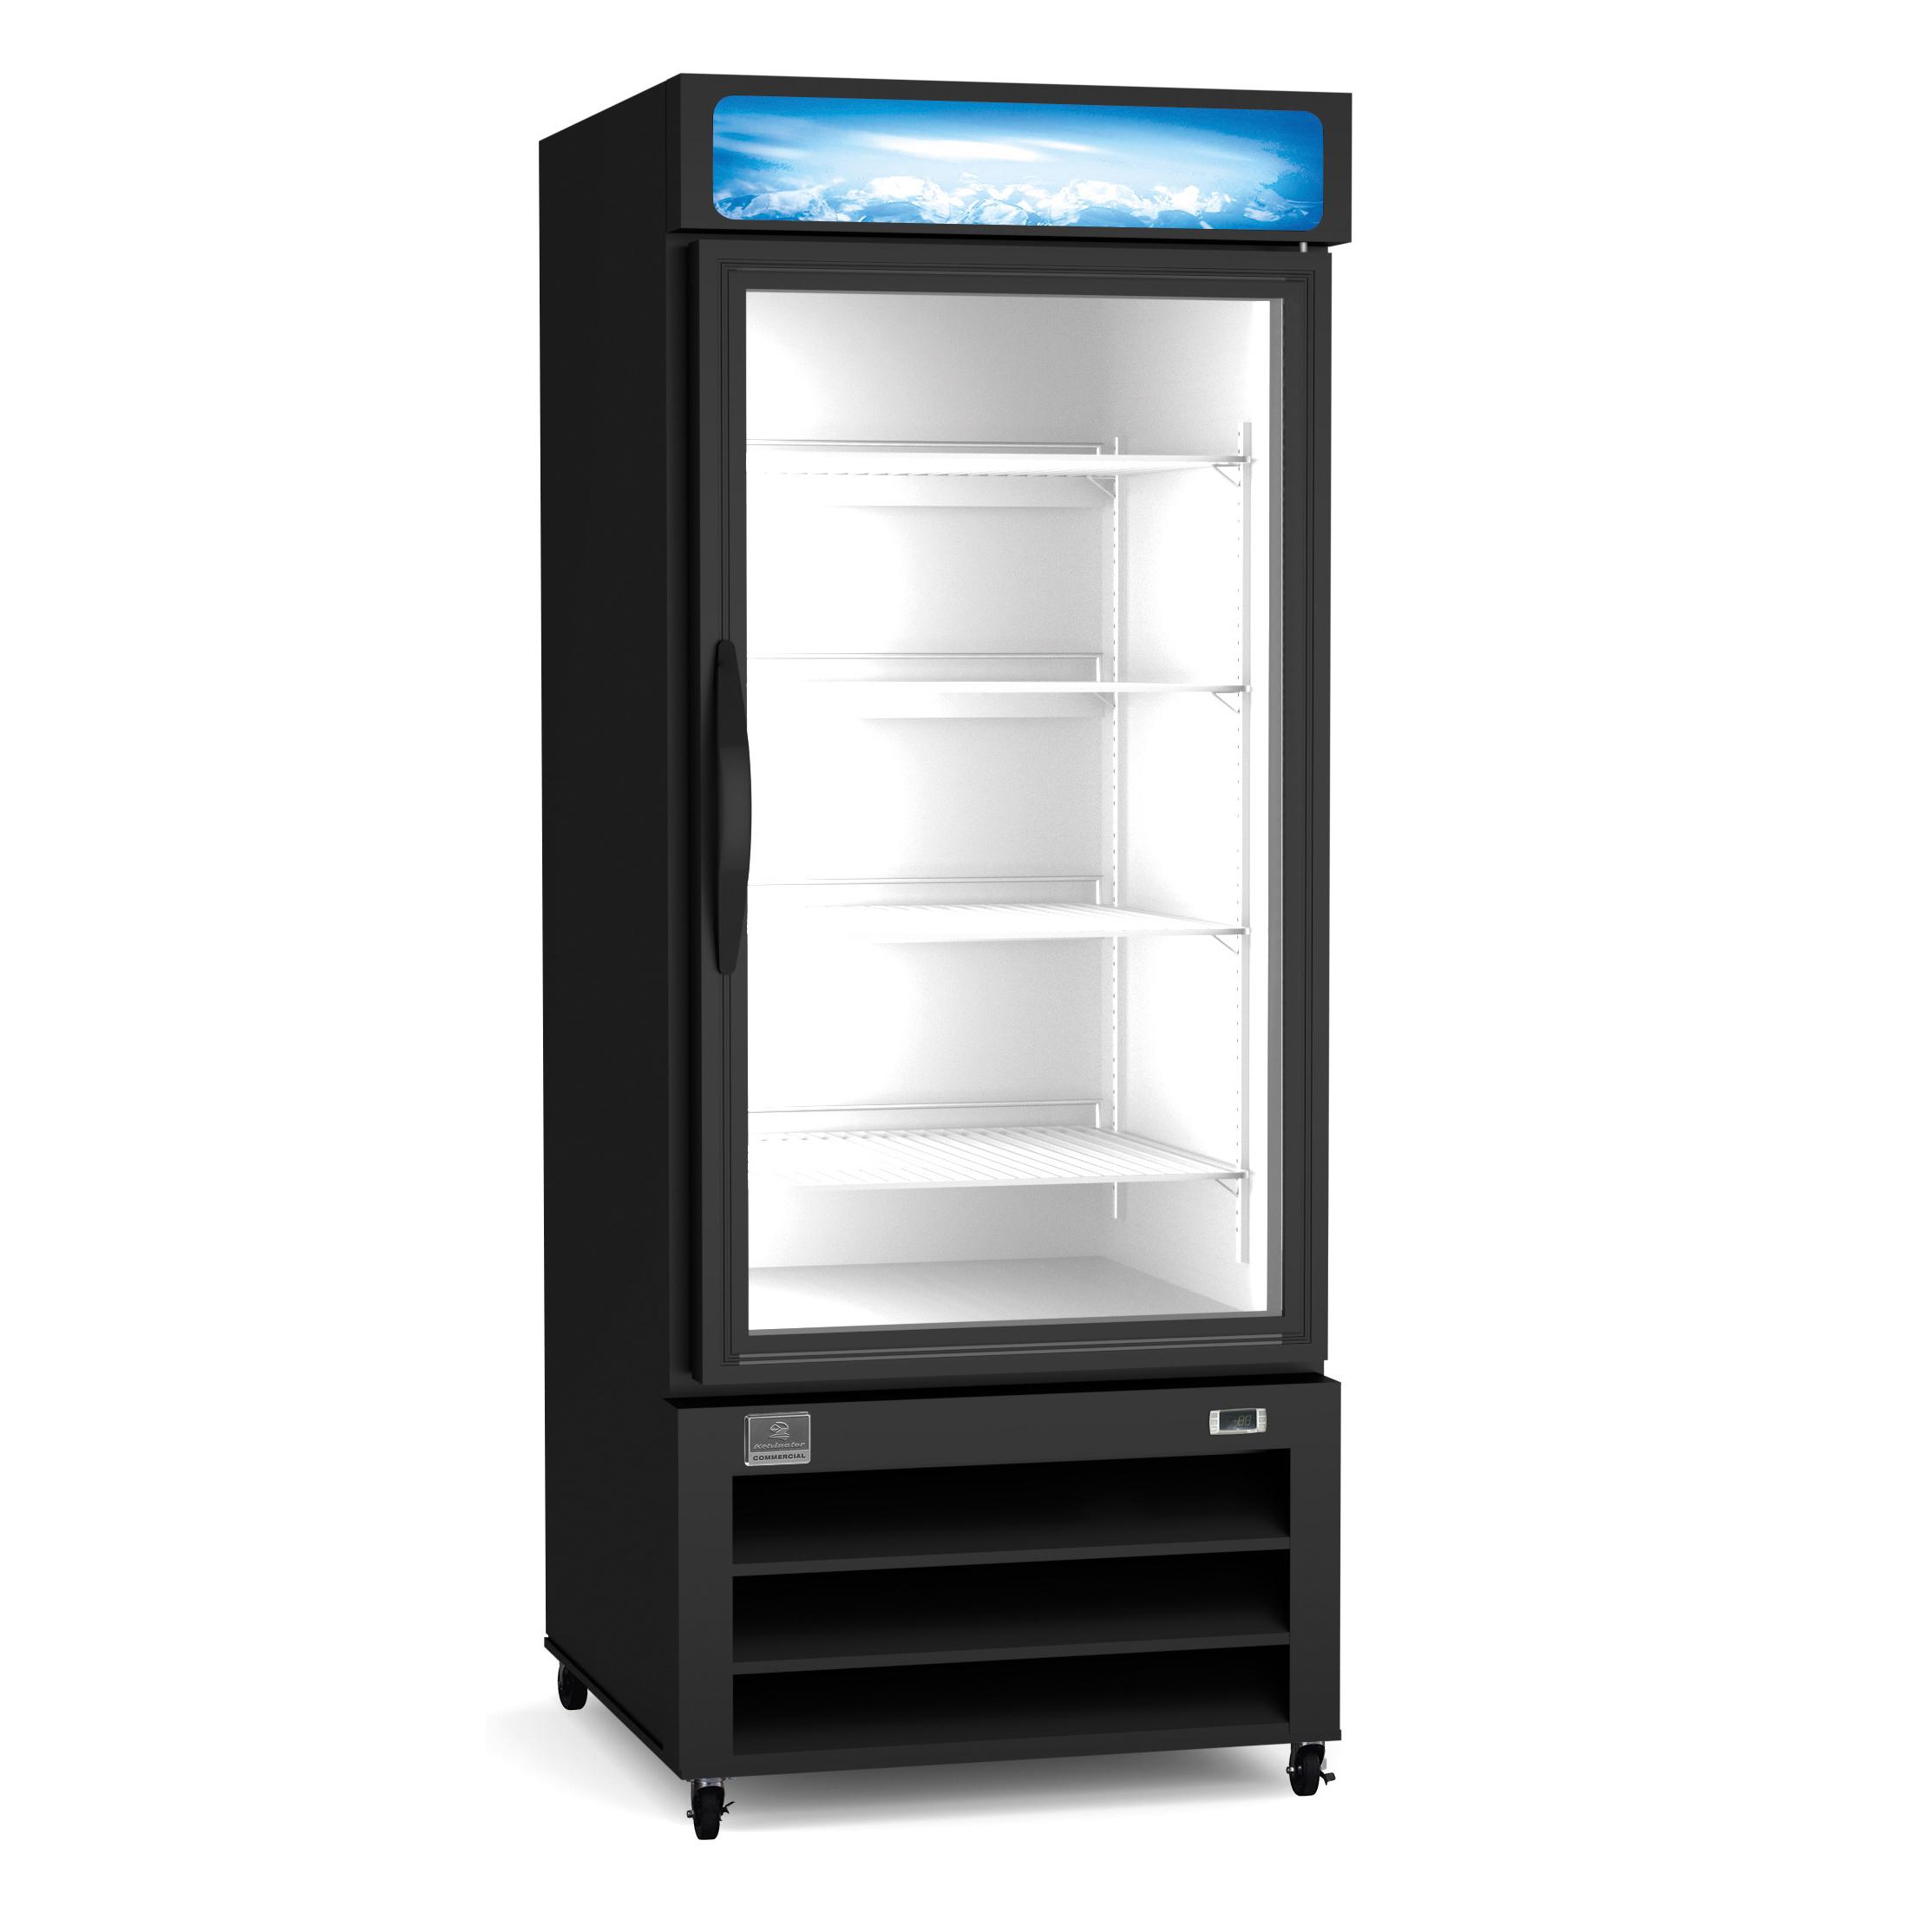 Kelvinator Commercial KCHGM26F freezer, merchandiser